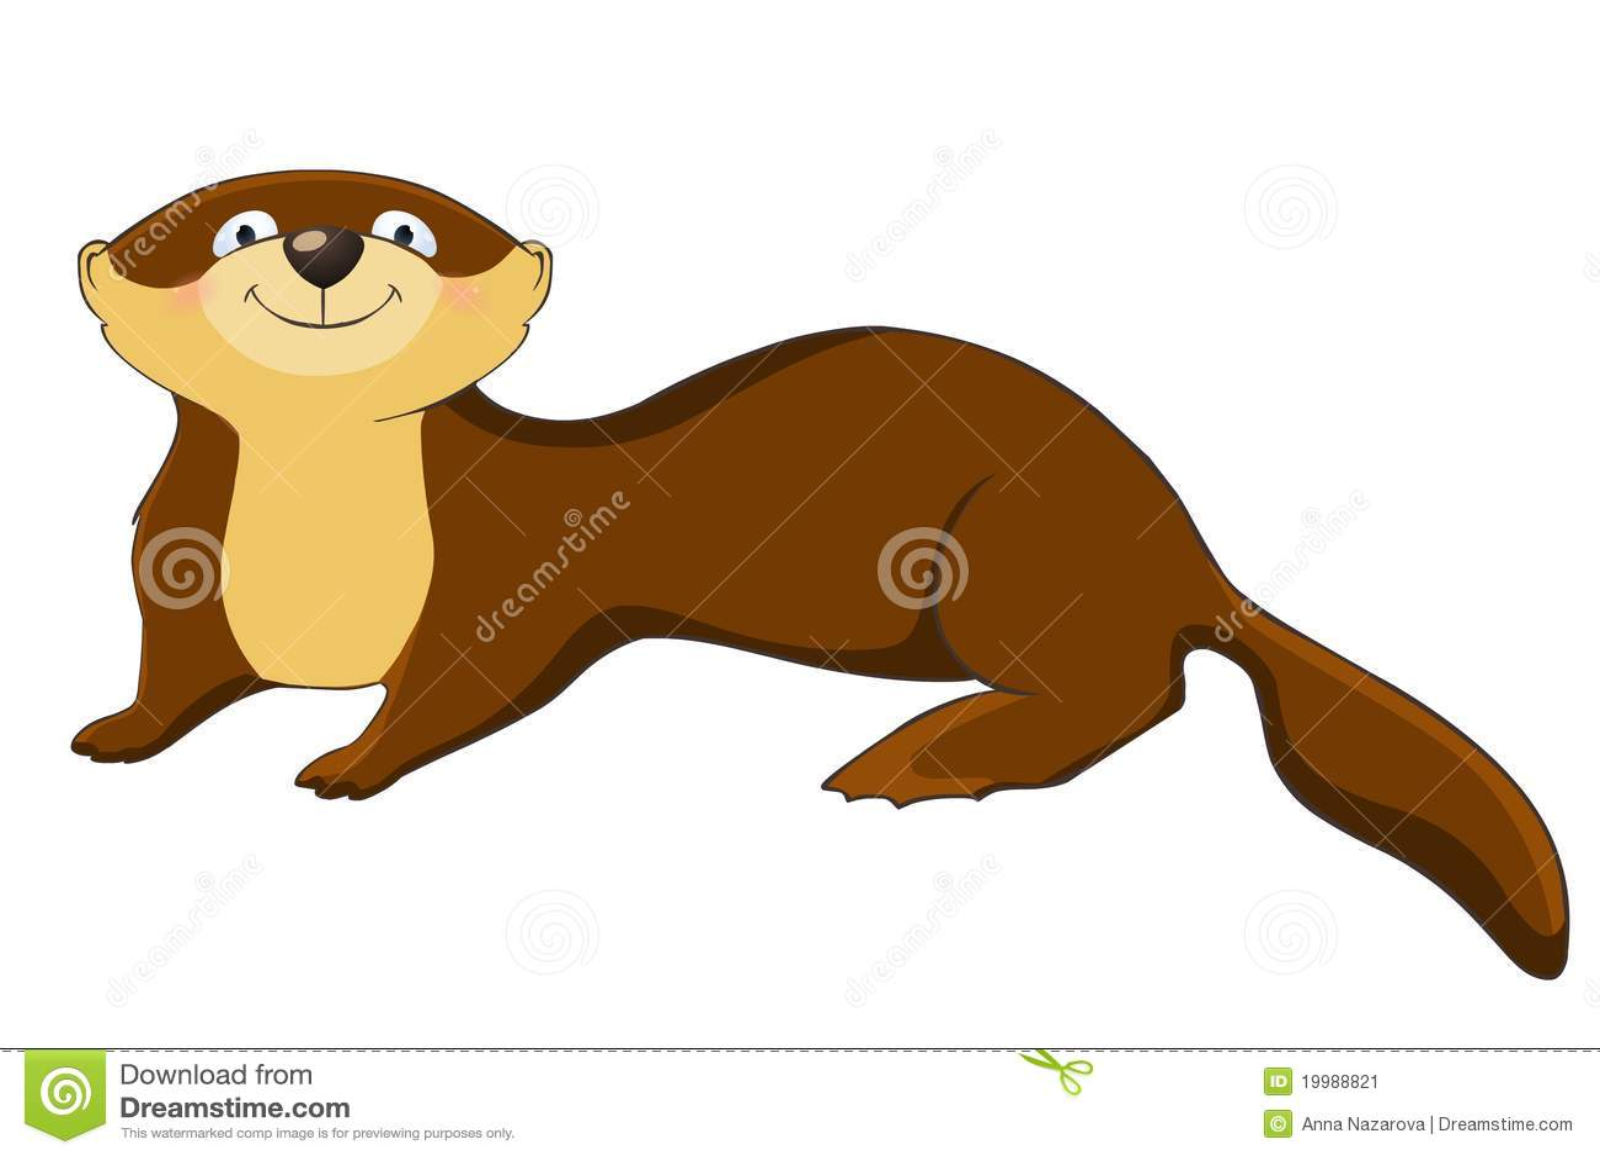 Funny Otter Stock Image - Image: 19988821